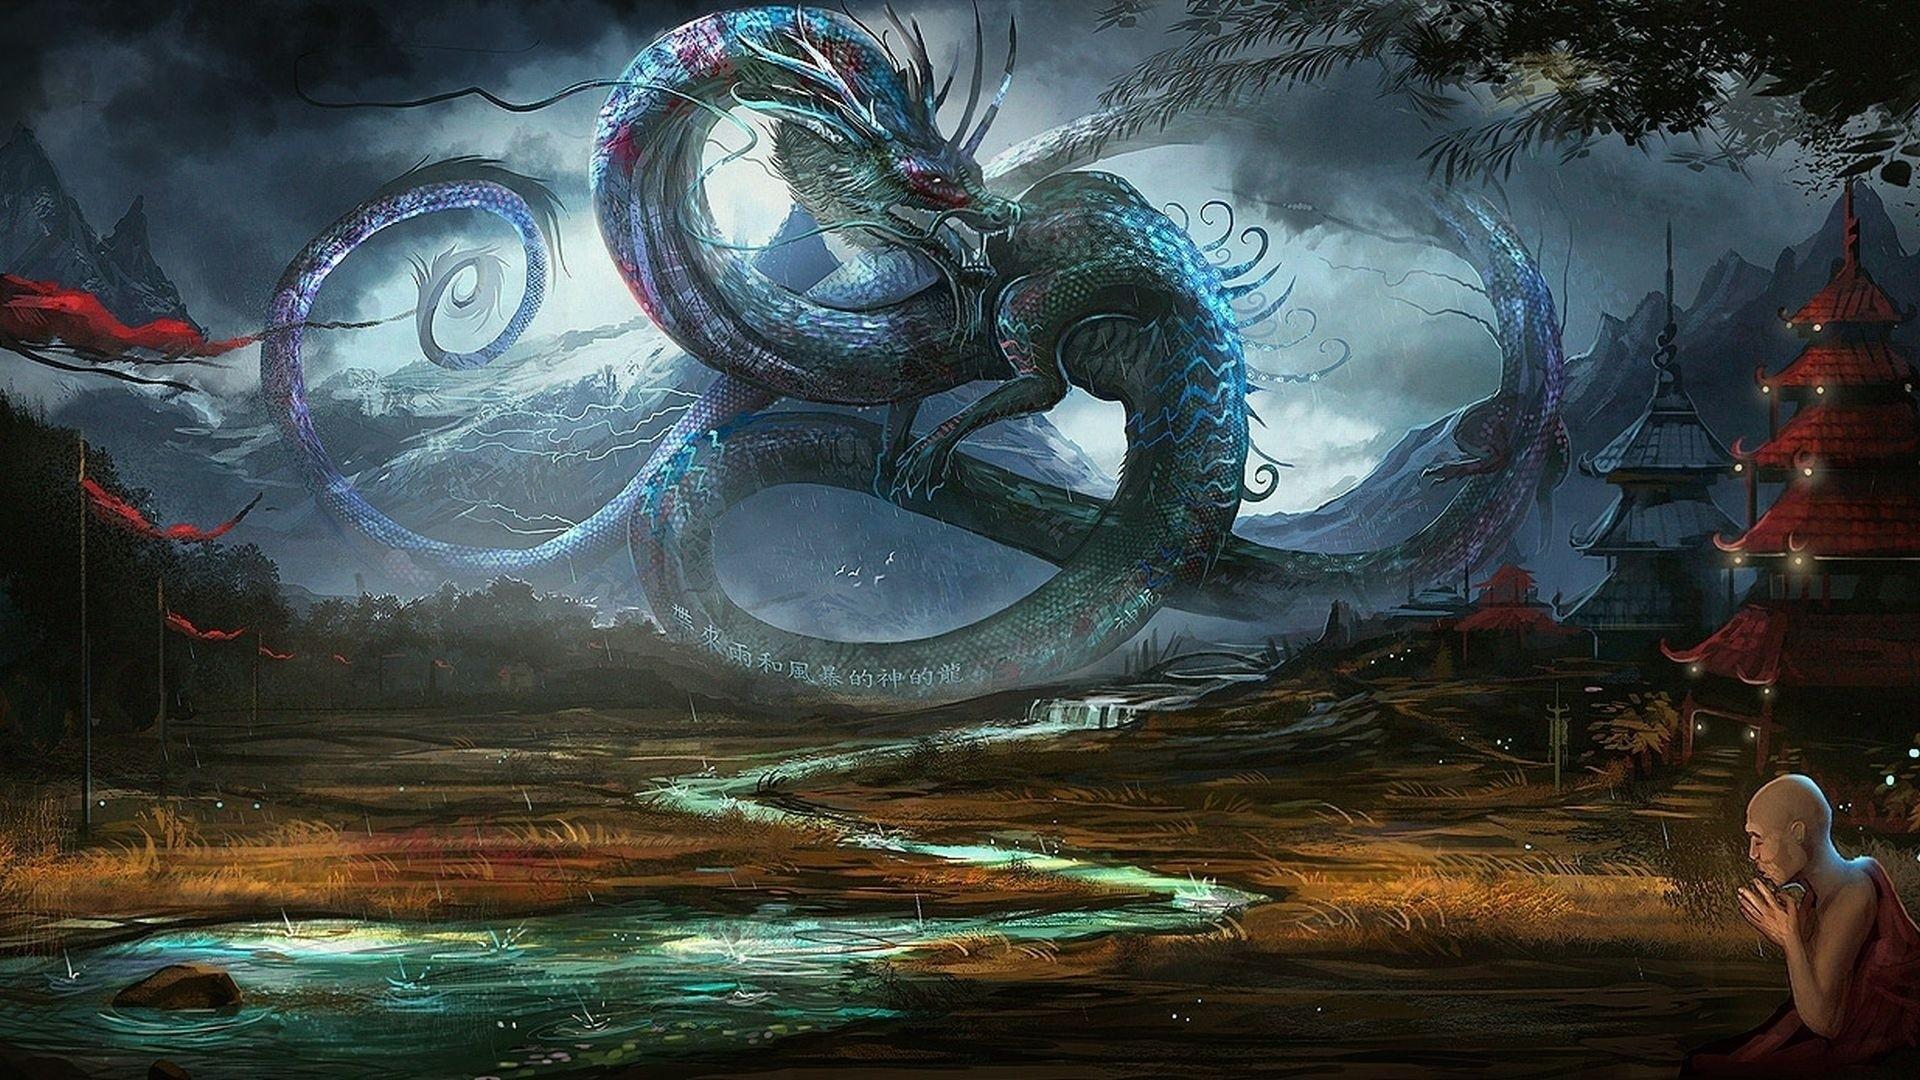 Fantasy Dragons Images Wallpaper | Full HD Wallpapers .